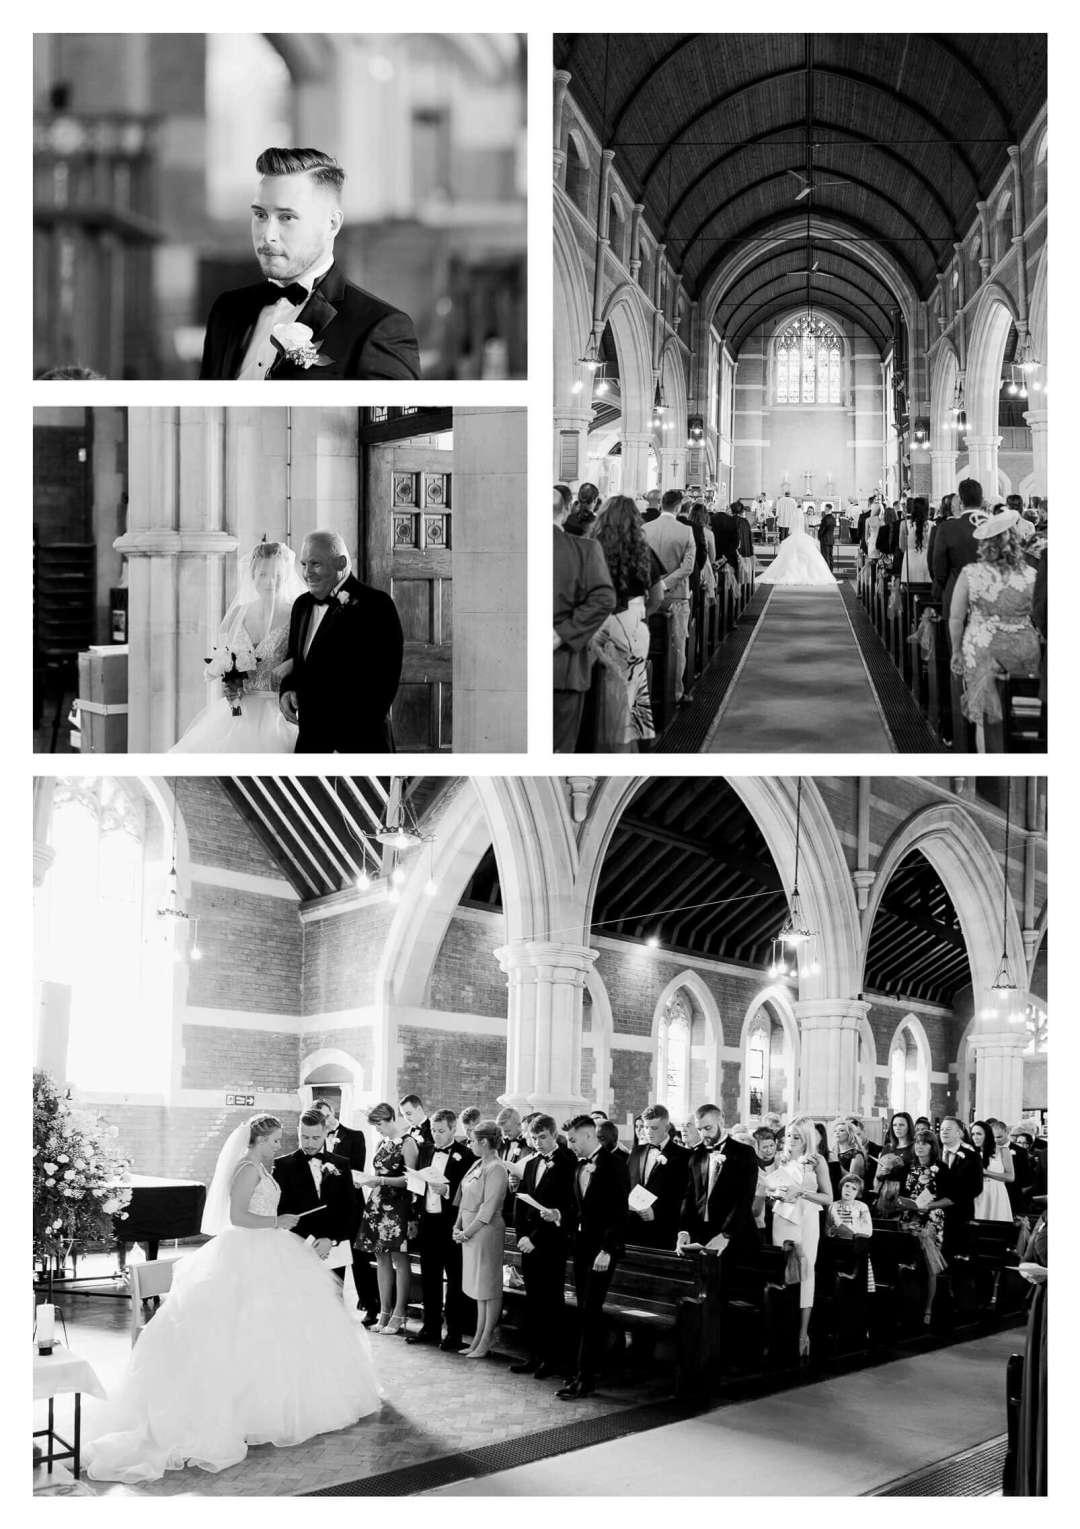 St Marks Church wedding ceremony | London wedding photographer